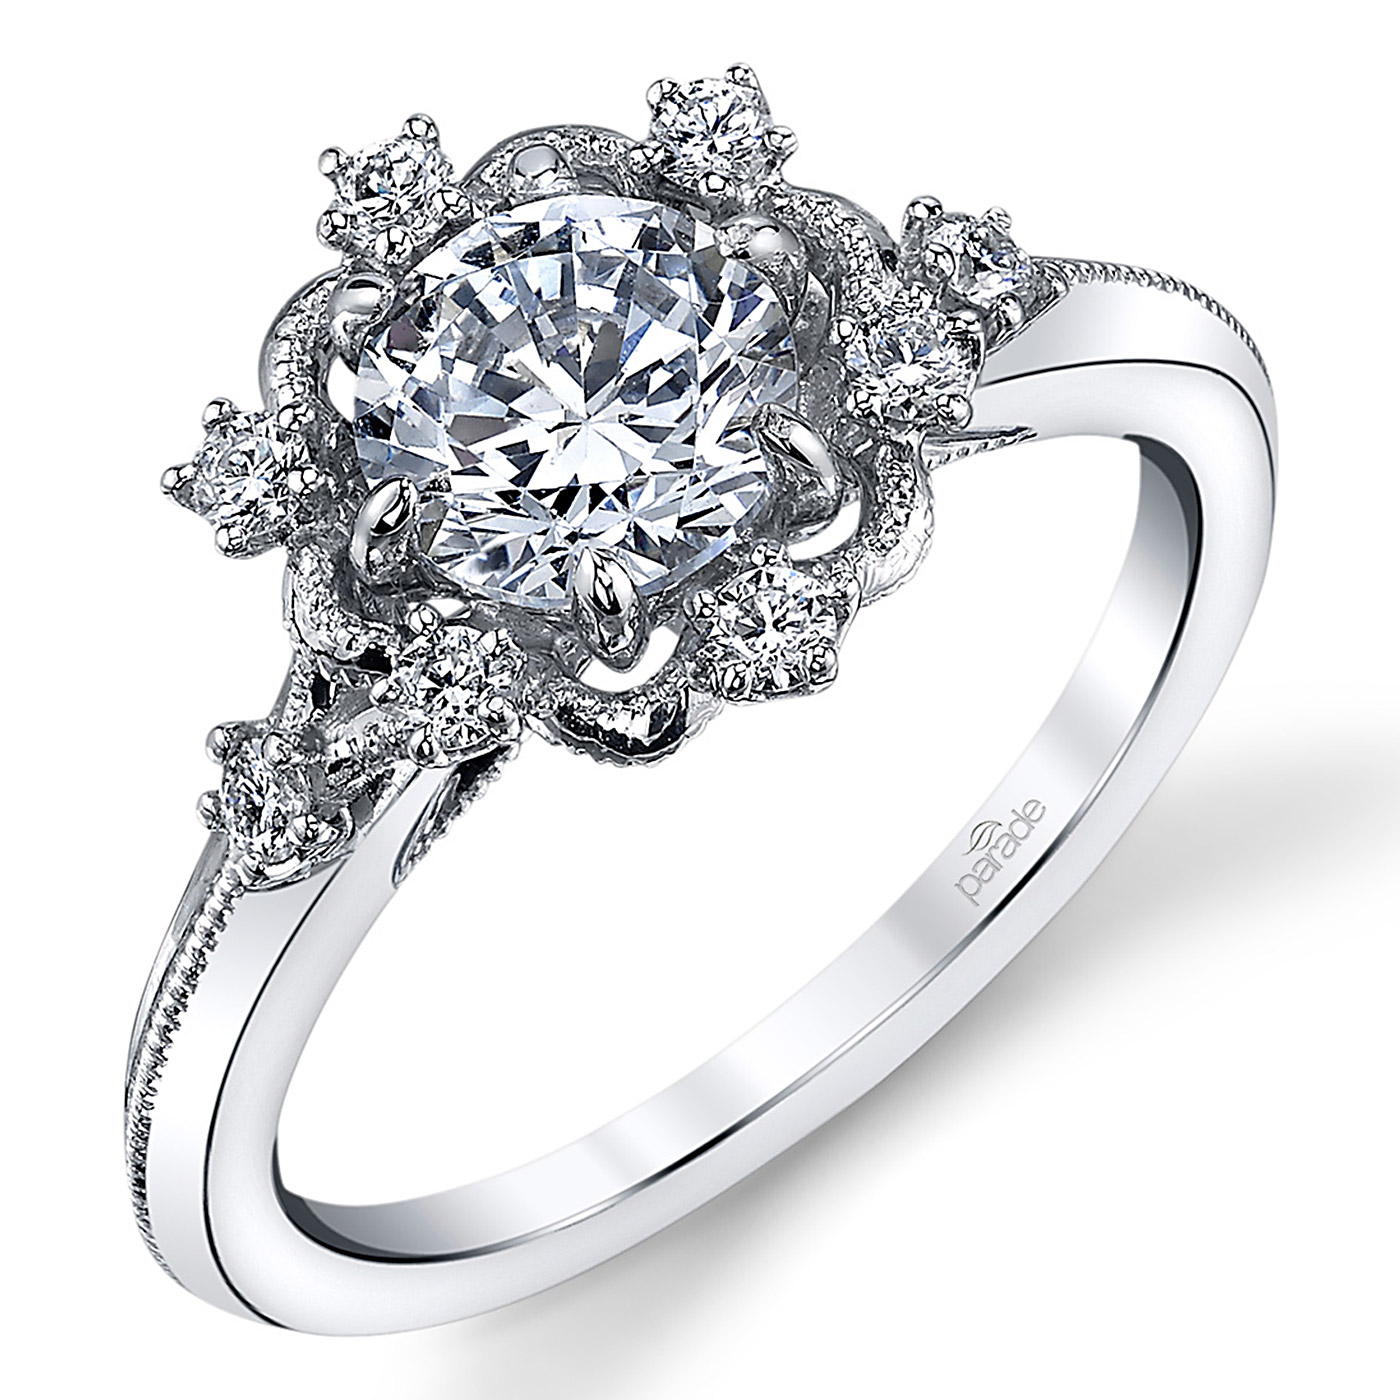 5fd733c15d5d Parade Hera Bridal 14 Karat Diamond Engagement Ring R3905